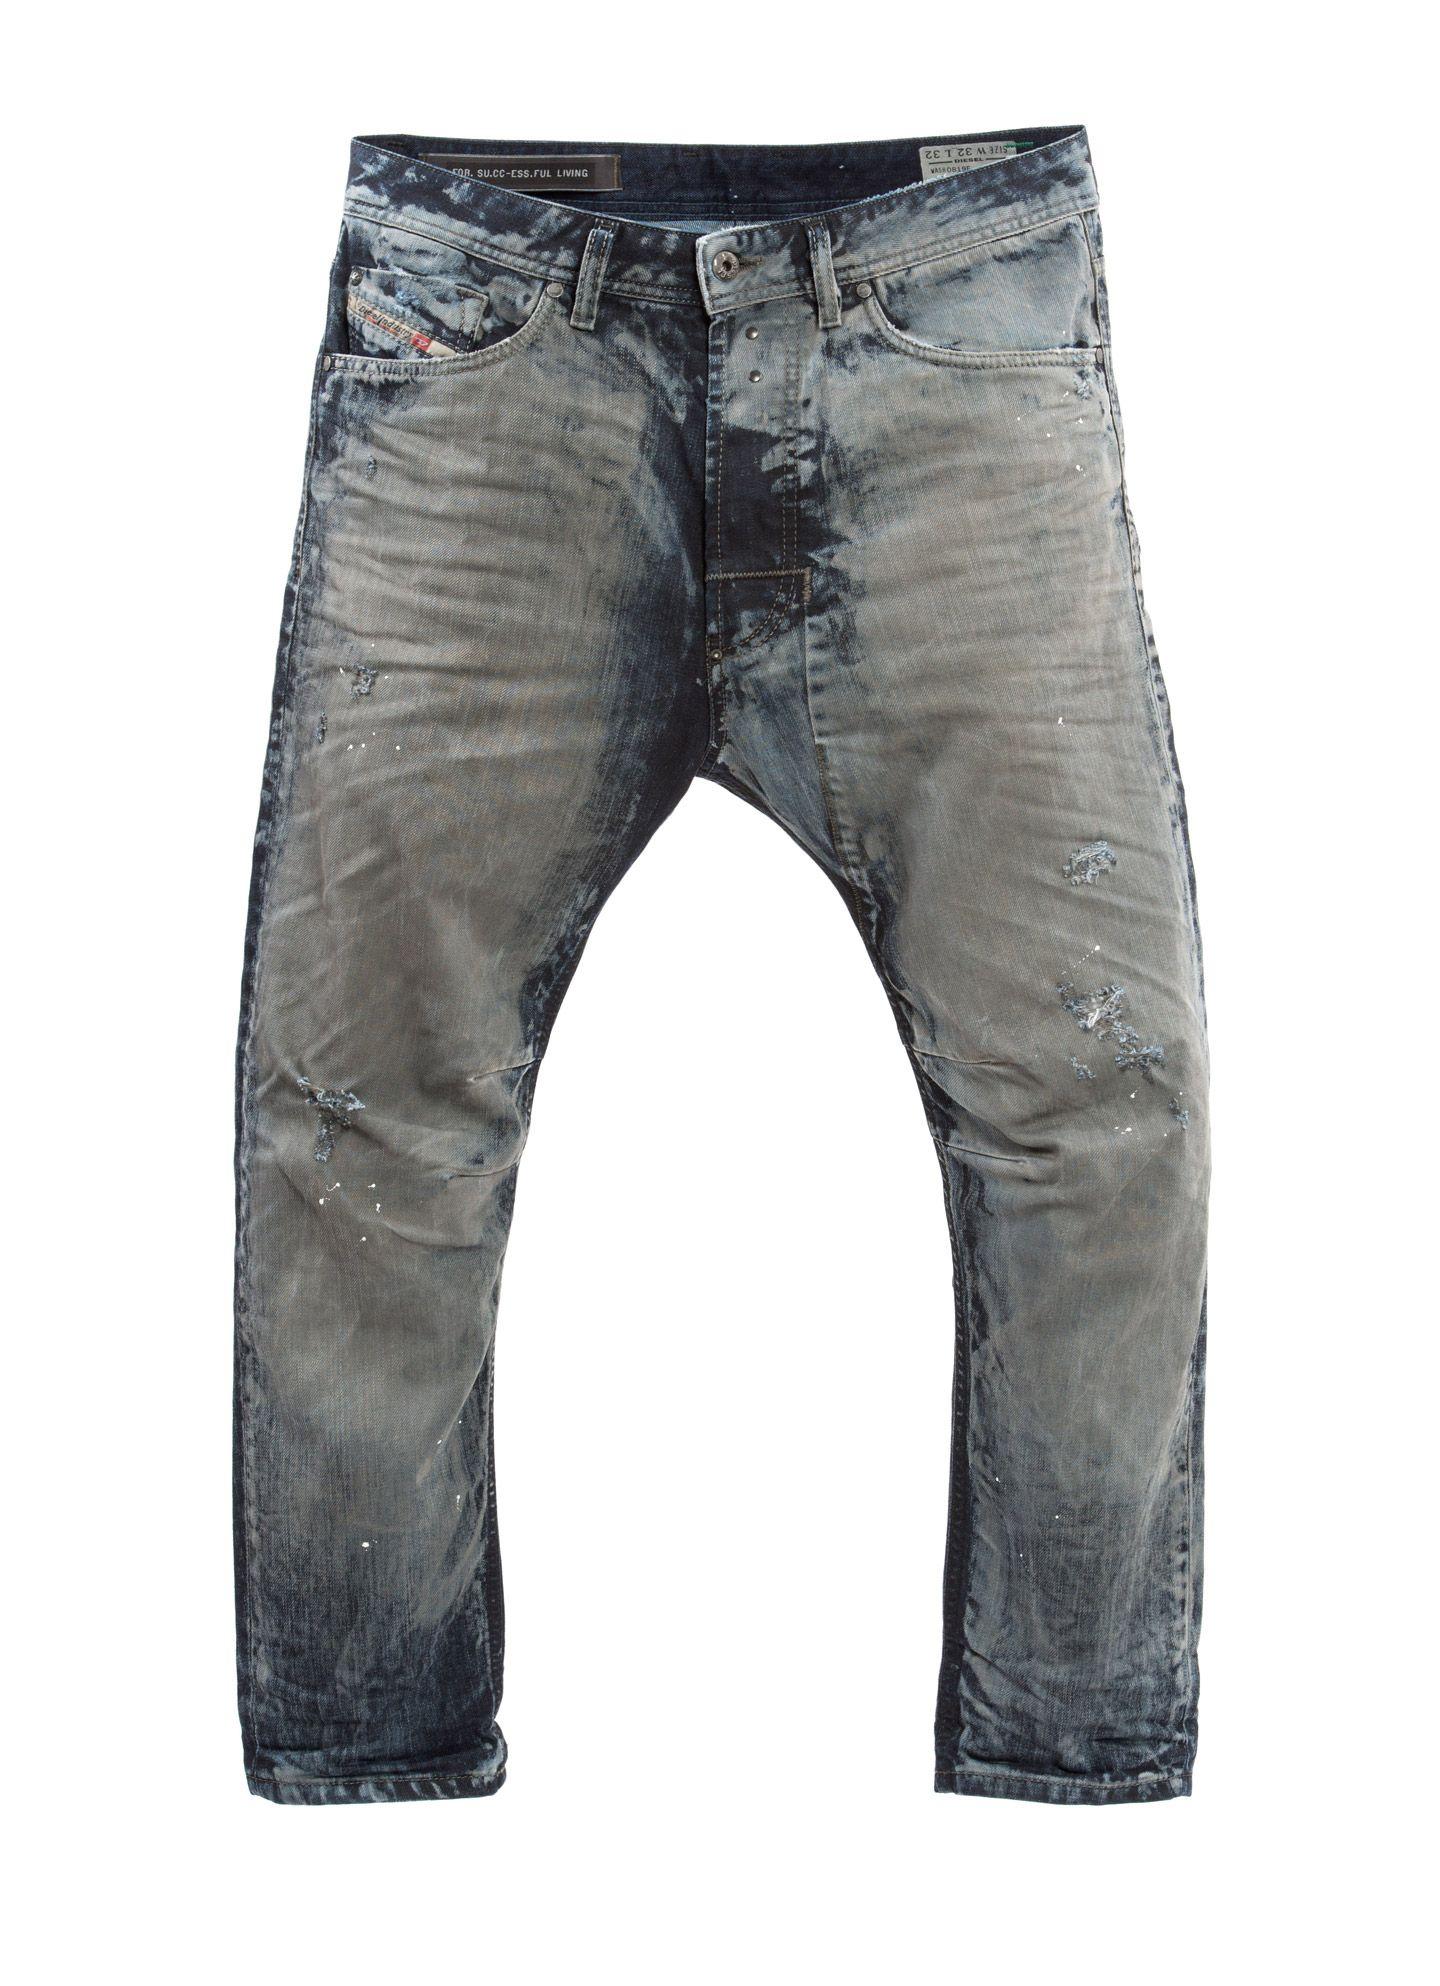 f9052d2aeb Diesel - Men s Apparel - Male clothes